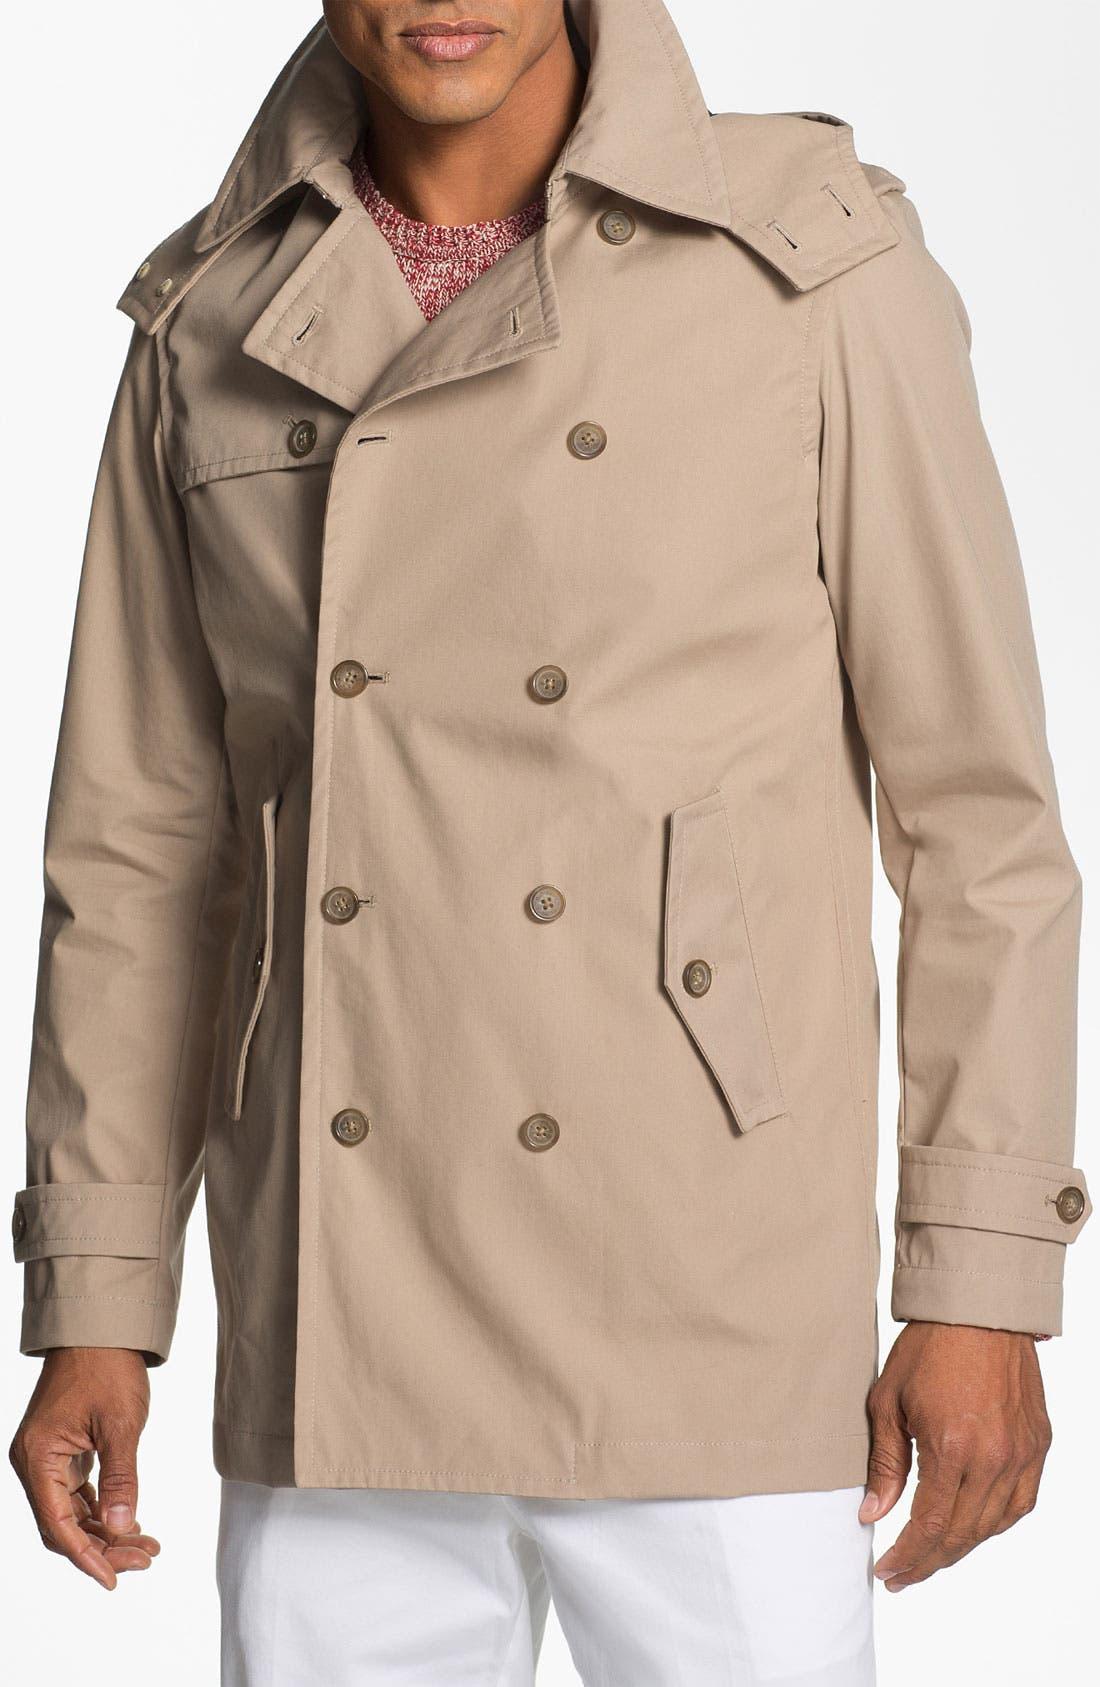 Alternate Image 1 Selected - Michael Kors Hooded Trench Coat